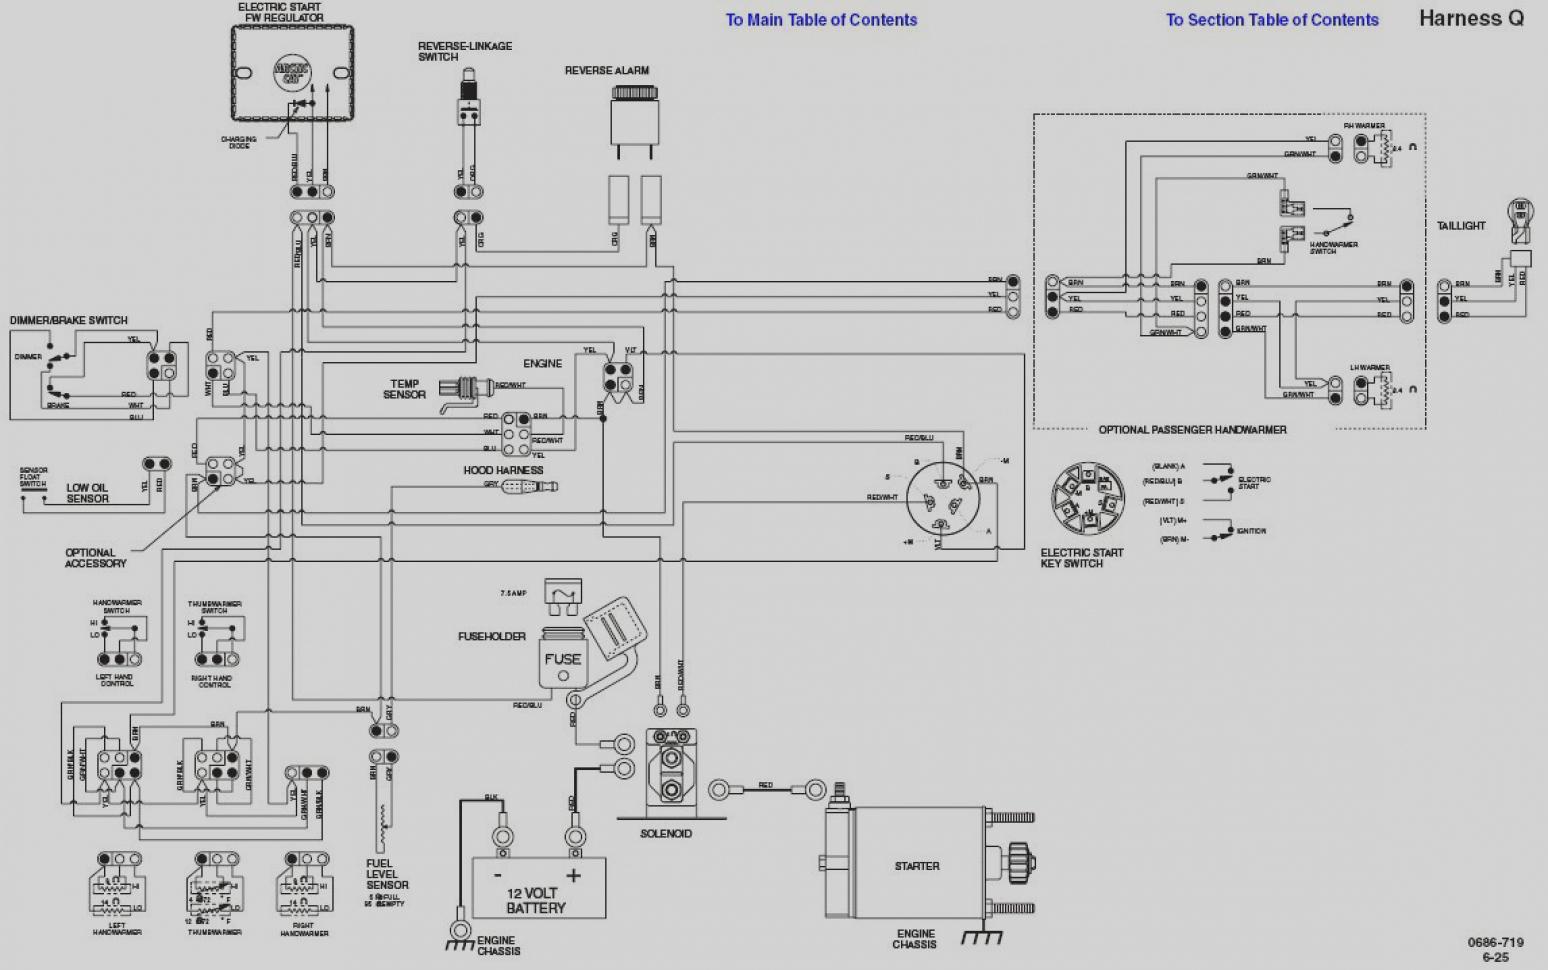 OF_9283] Ranger 800 Xp Fuse Box Schematic WiringProps Caba Viewor Flui Opein Mohammedshrine Librar Wiring 101